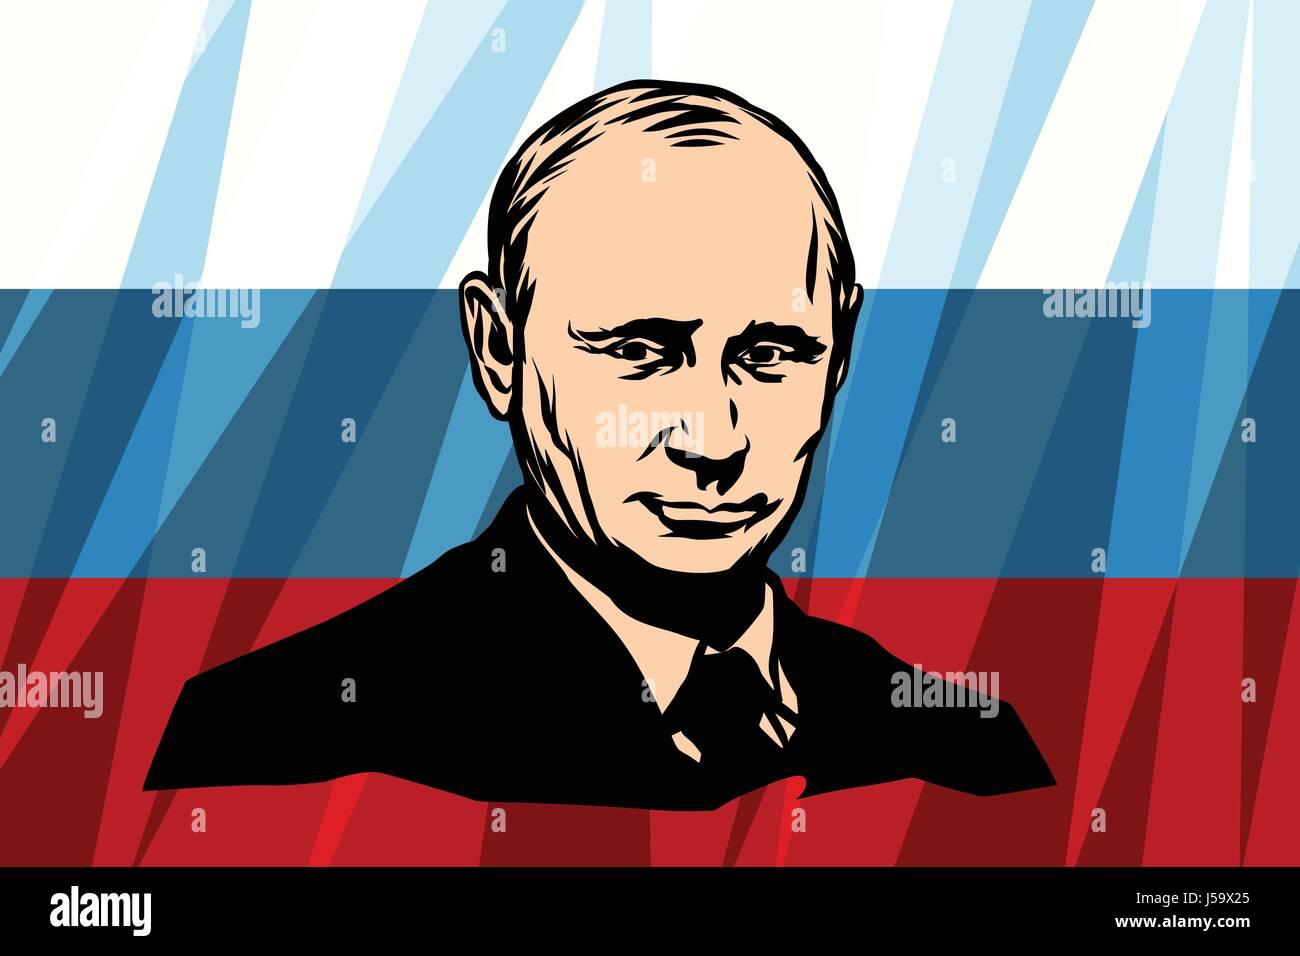 The President Of Russia Vladimir Vladimirovich Putin - Stock Image